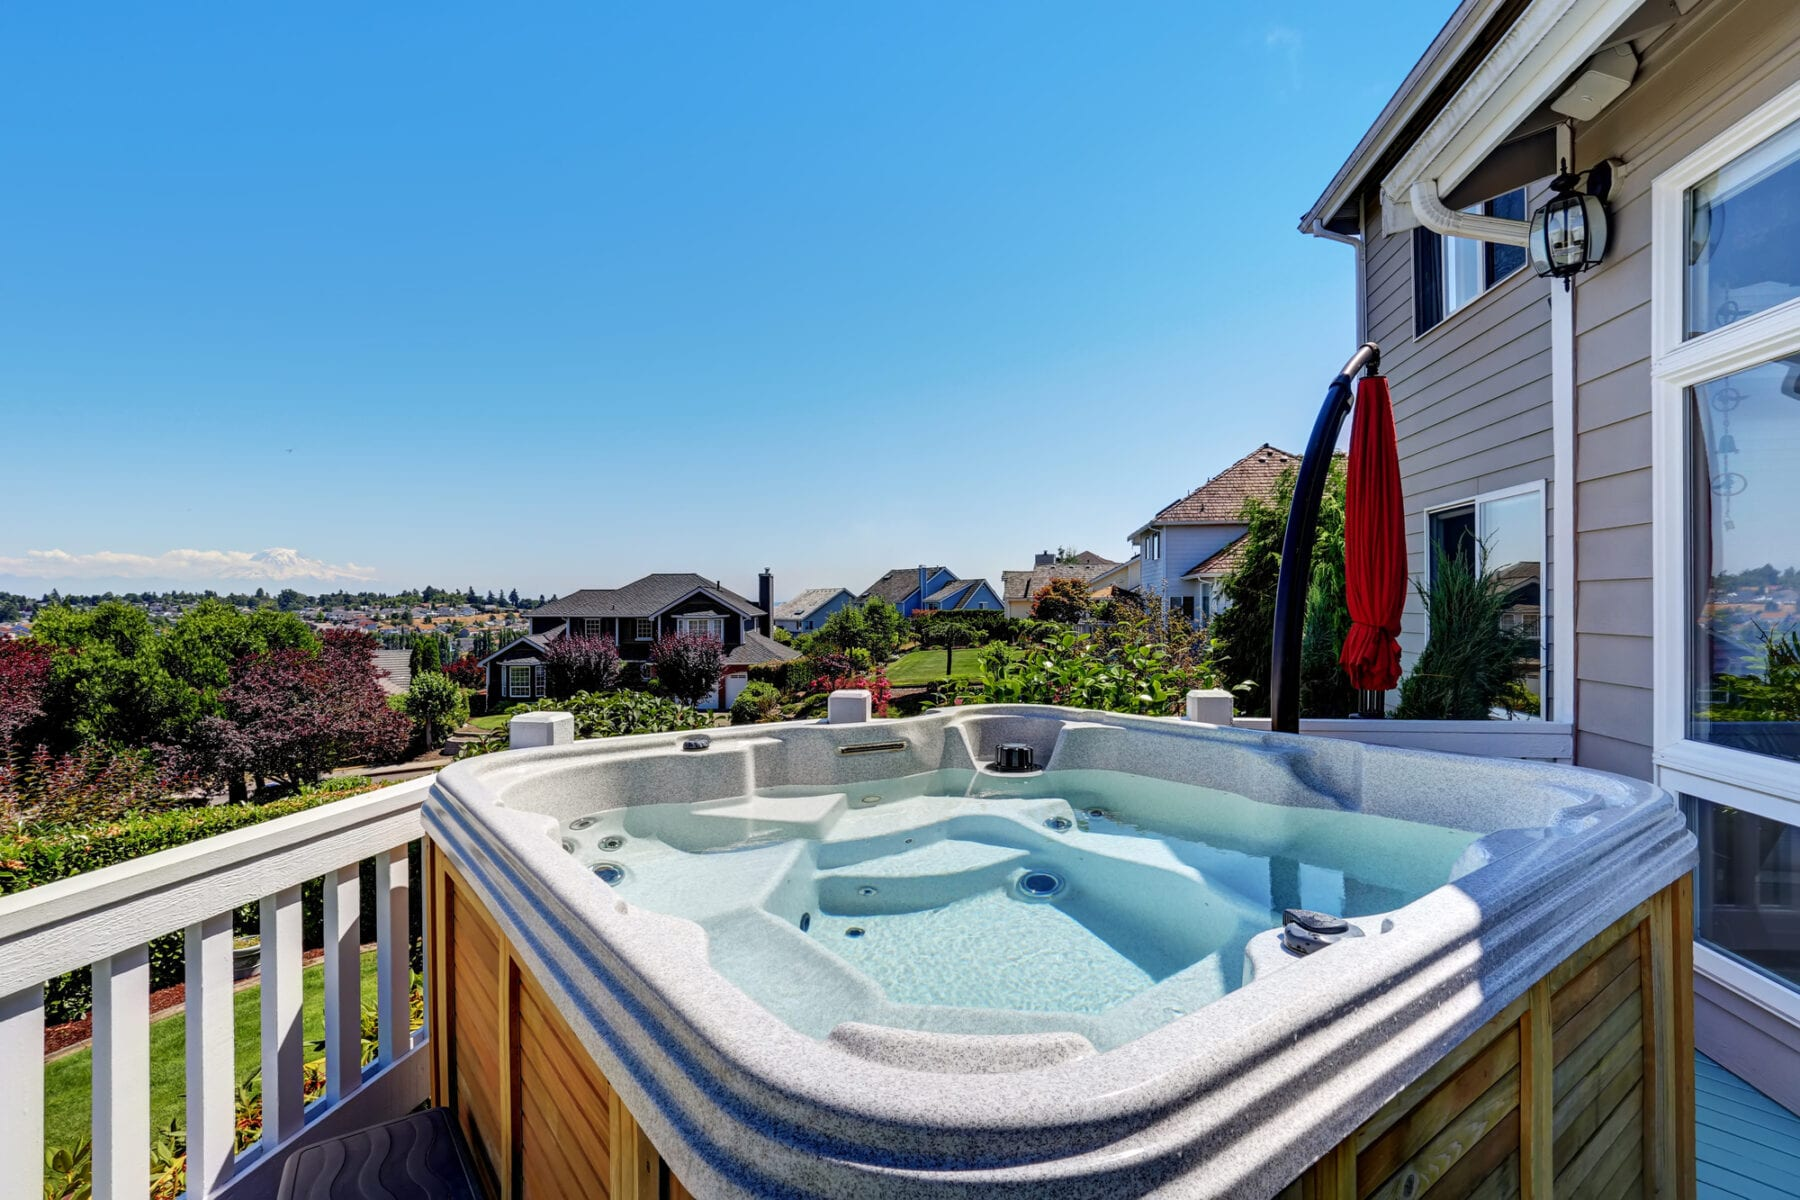 solar-powered hot tub